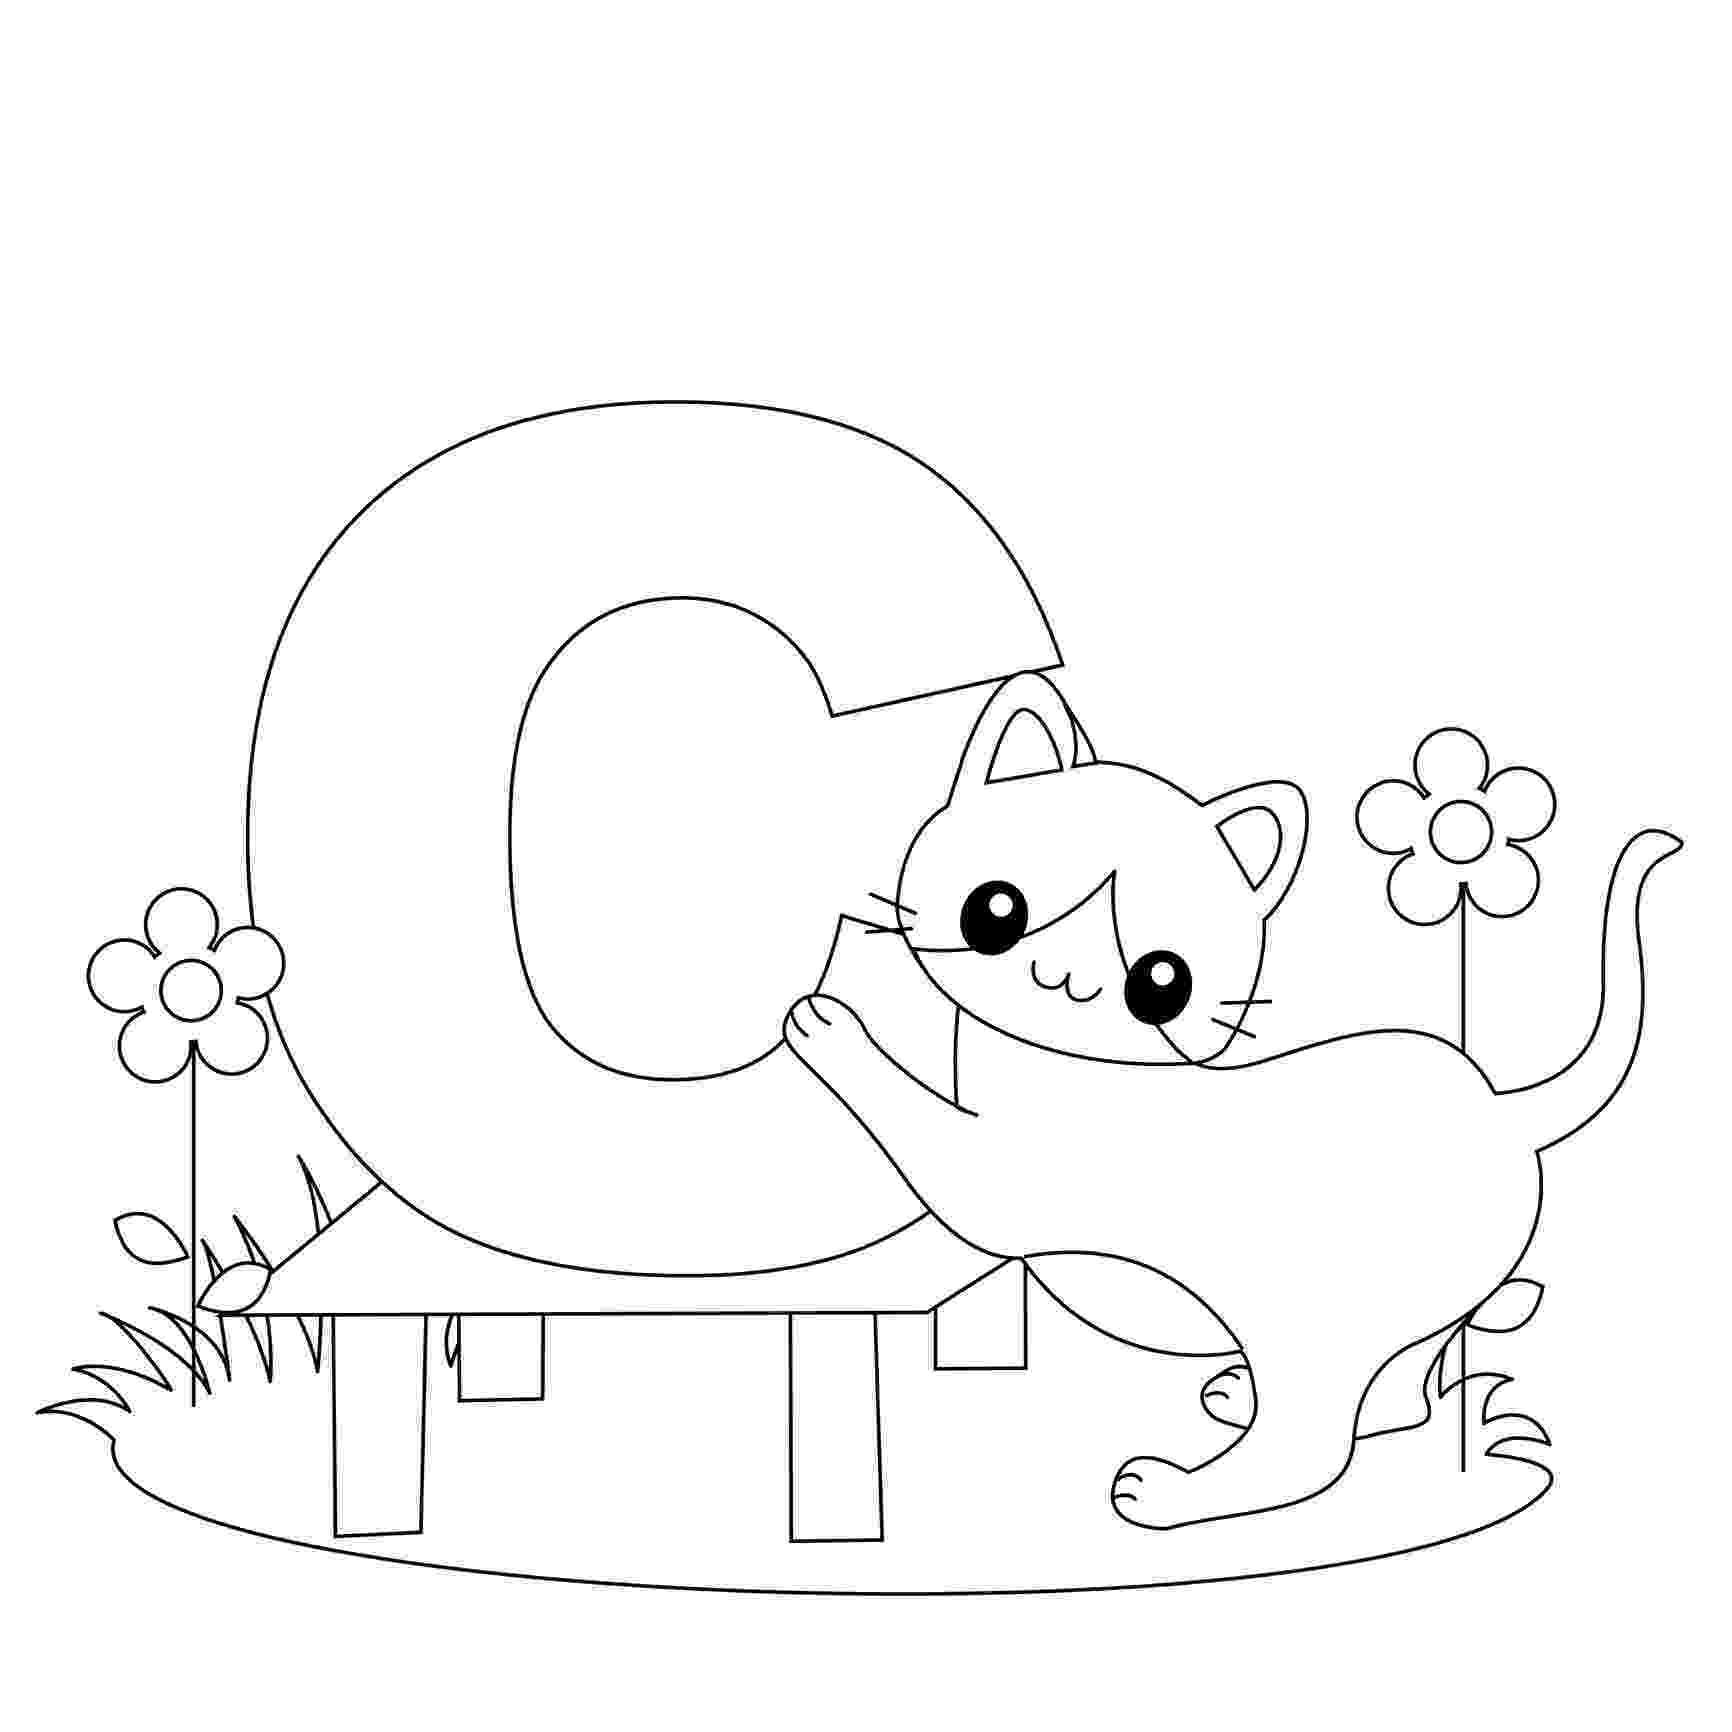 alphabet coloring worksheets free printable alphabet coloring pages for kids best alphabet coloring worksheets 1 2